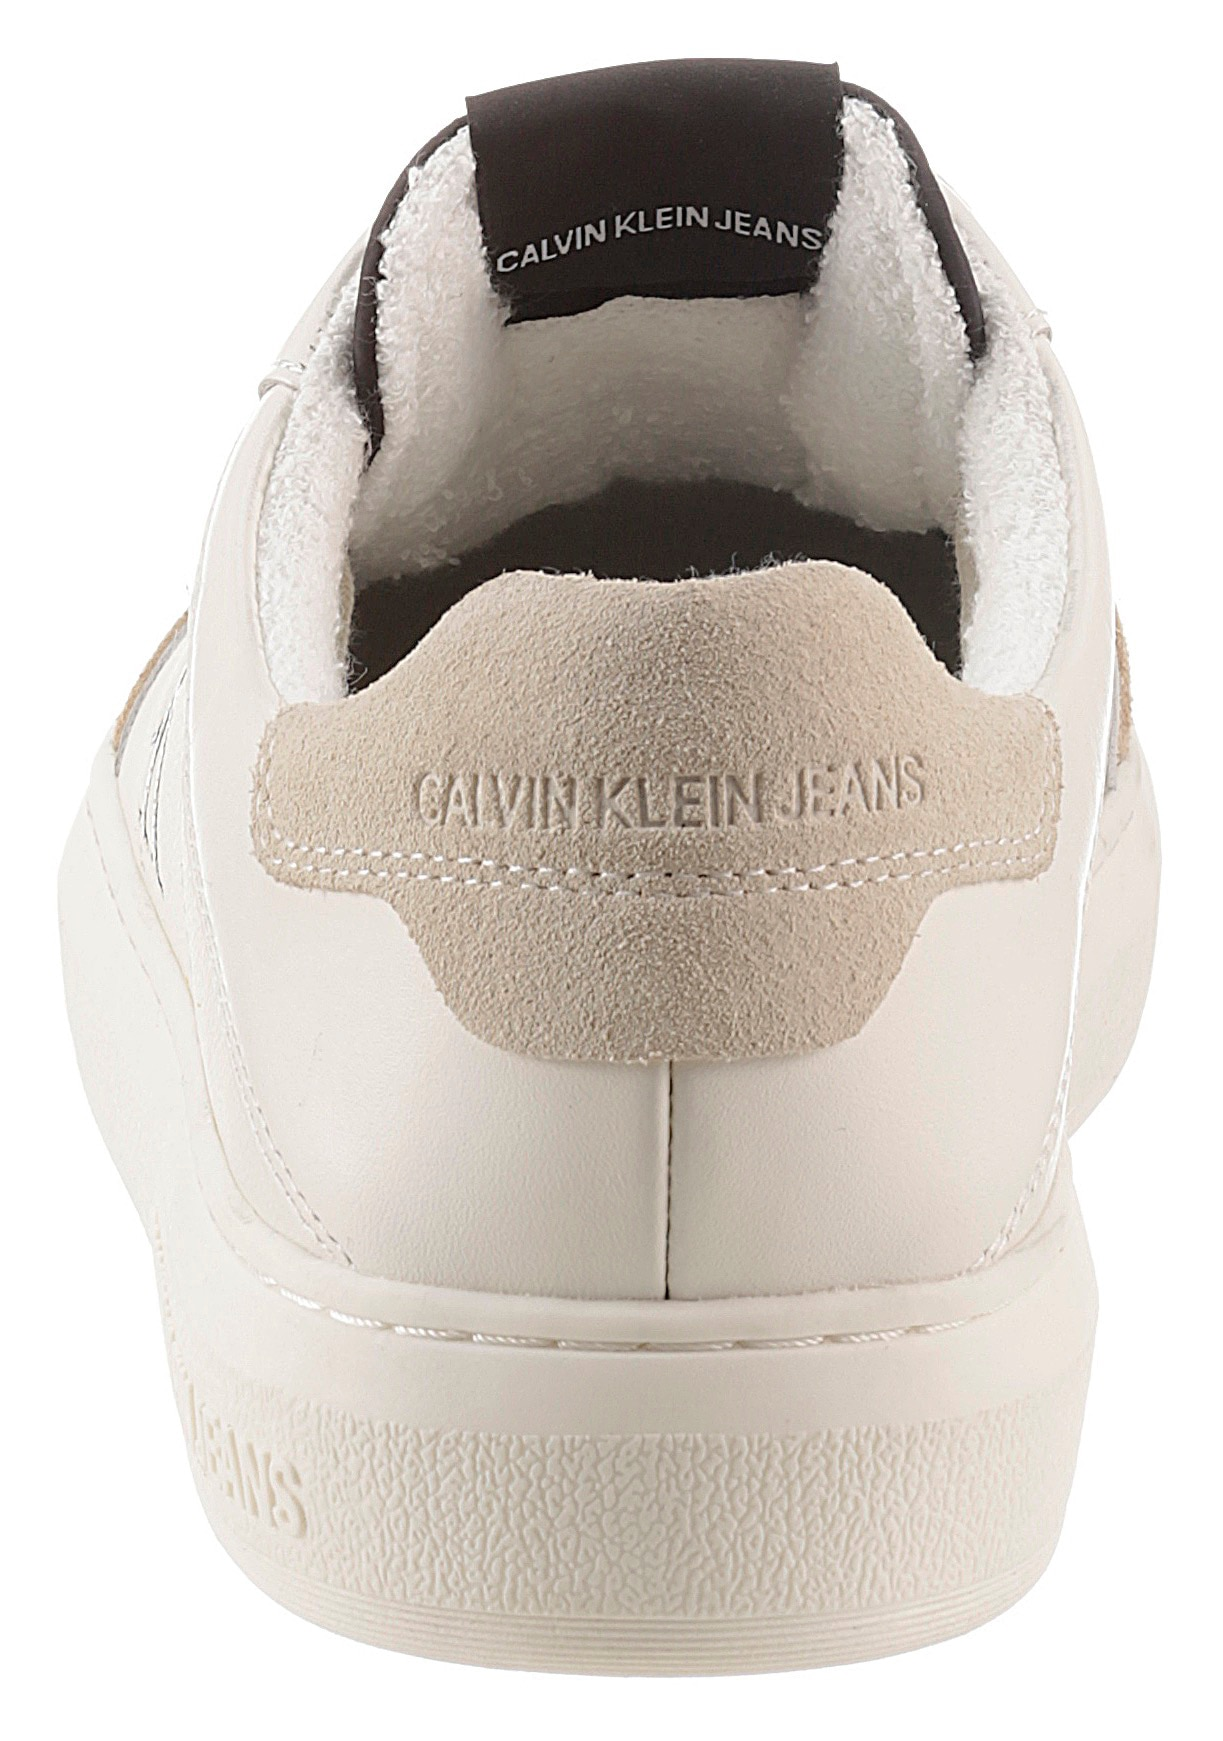 calvin klein -  Sneaker, mit kontrastfarbenem Logo